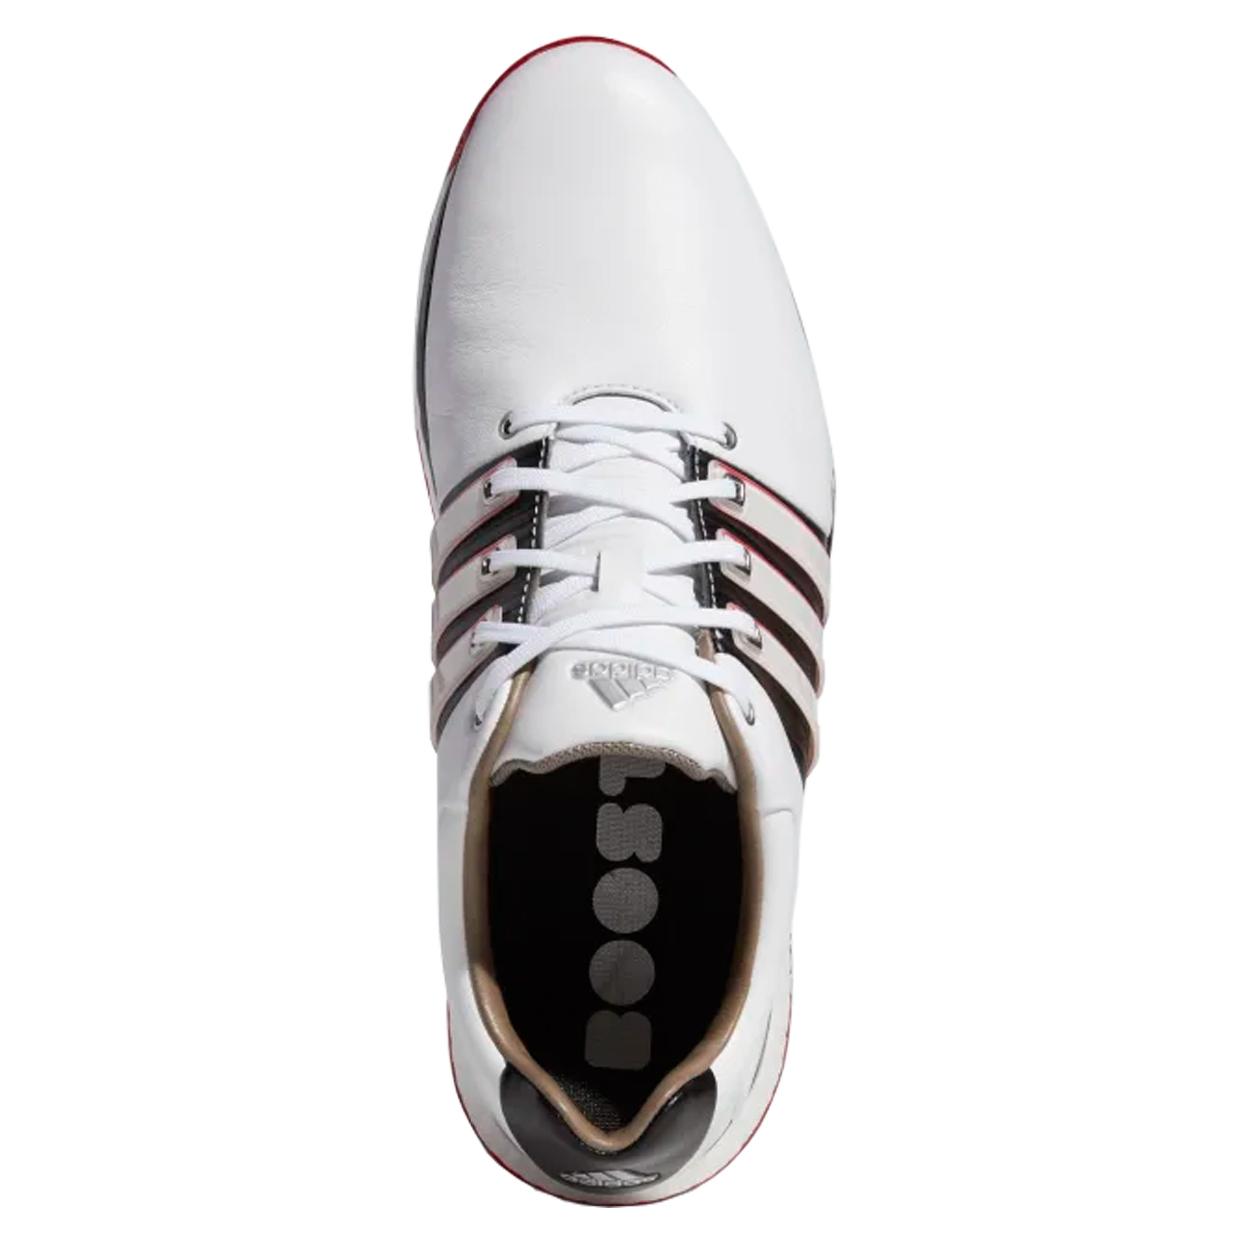 Adidas-Men-039-s-Tour-360-XT-Leather-Replaceable-Soft-Spike-Golf-Shoe-Brand-New thumbnail 8